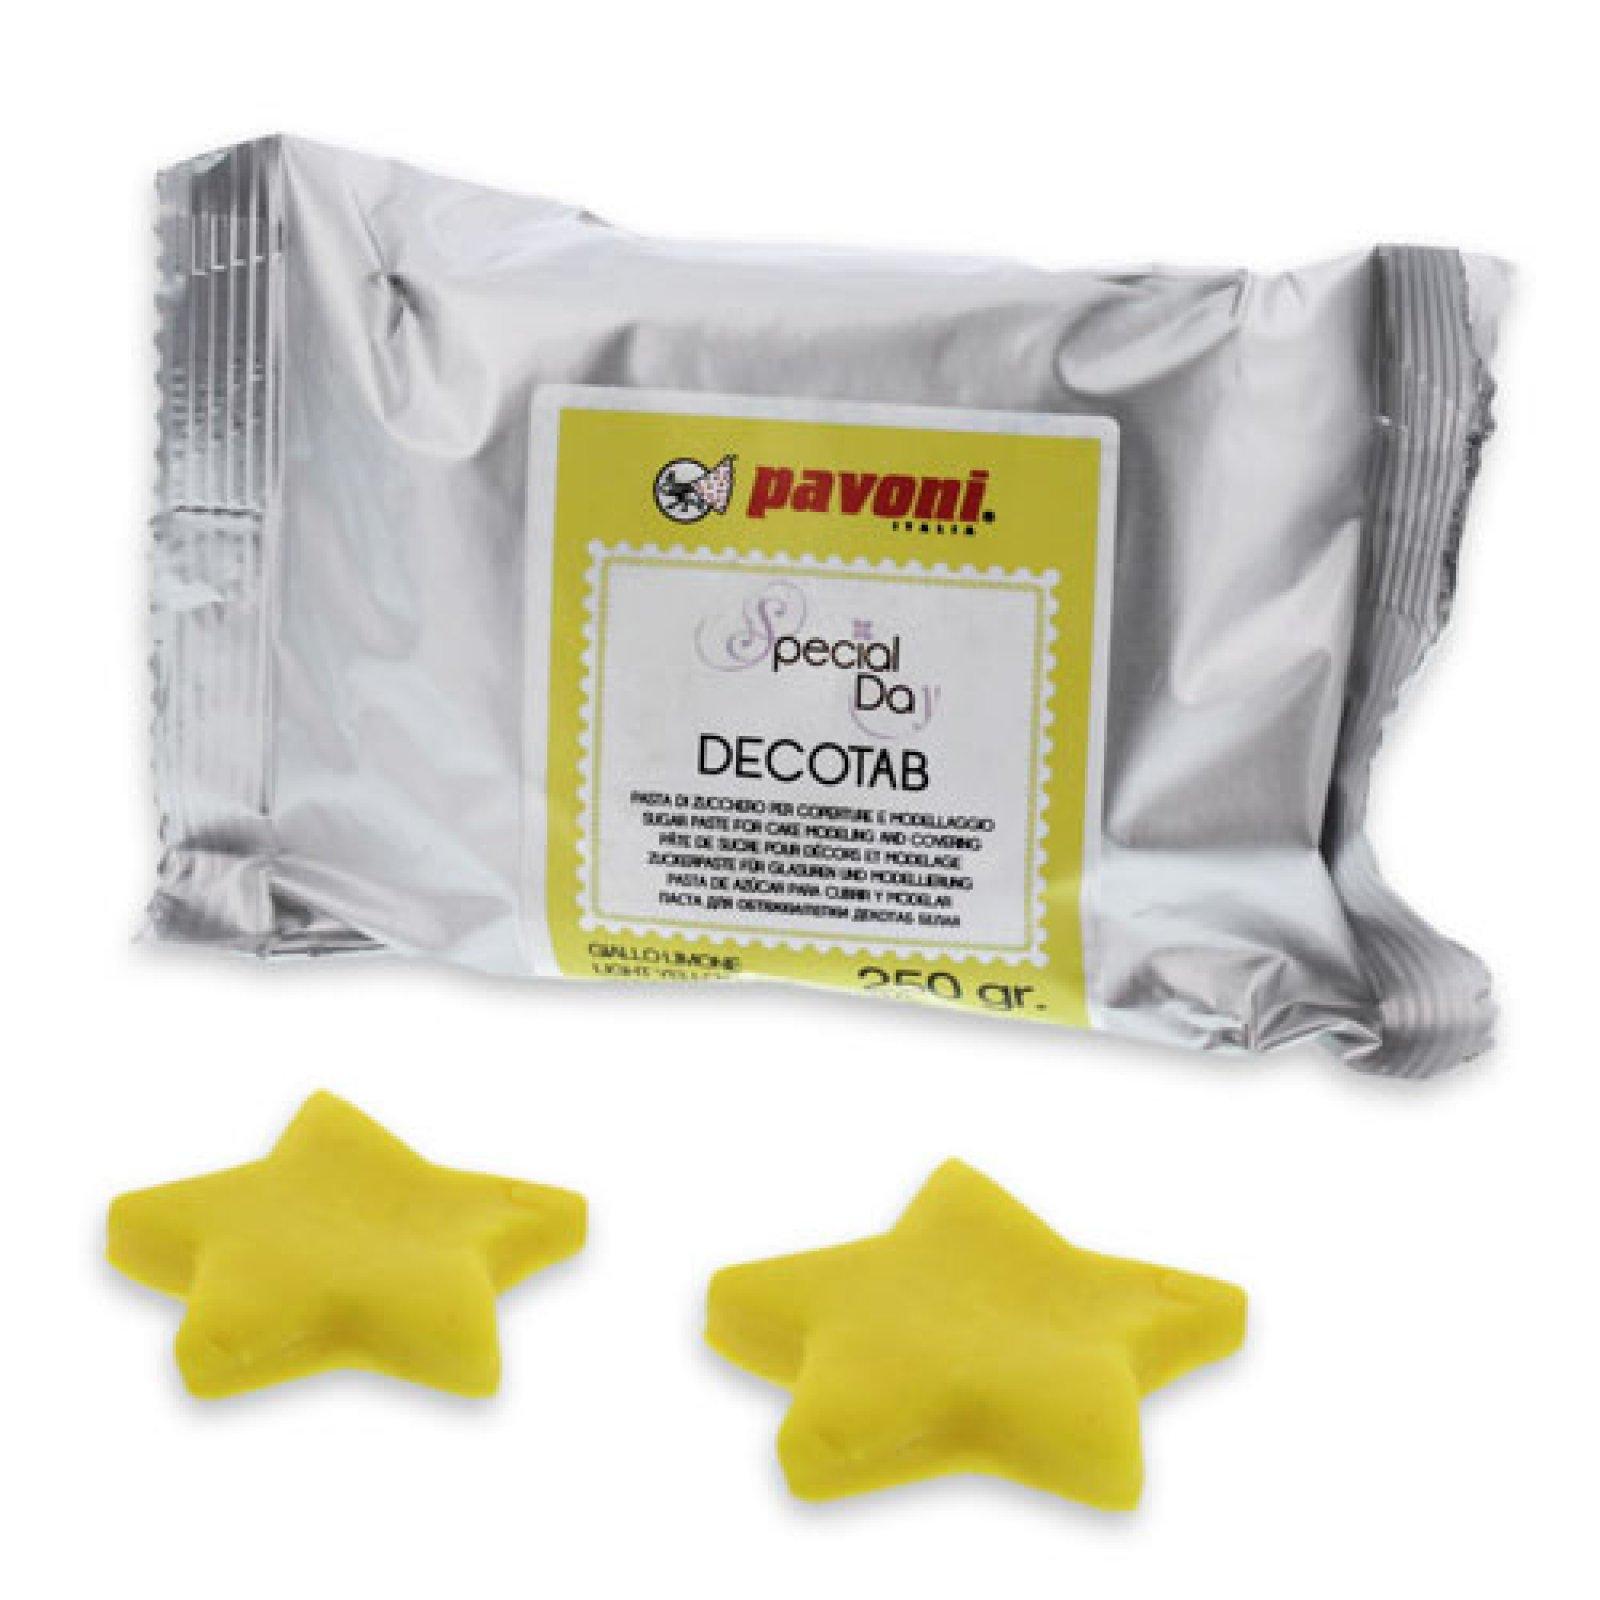 pavoni decotab fondant in gelb der ideen. Black Bedroom Furniture Sets. Home Design Ideas